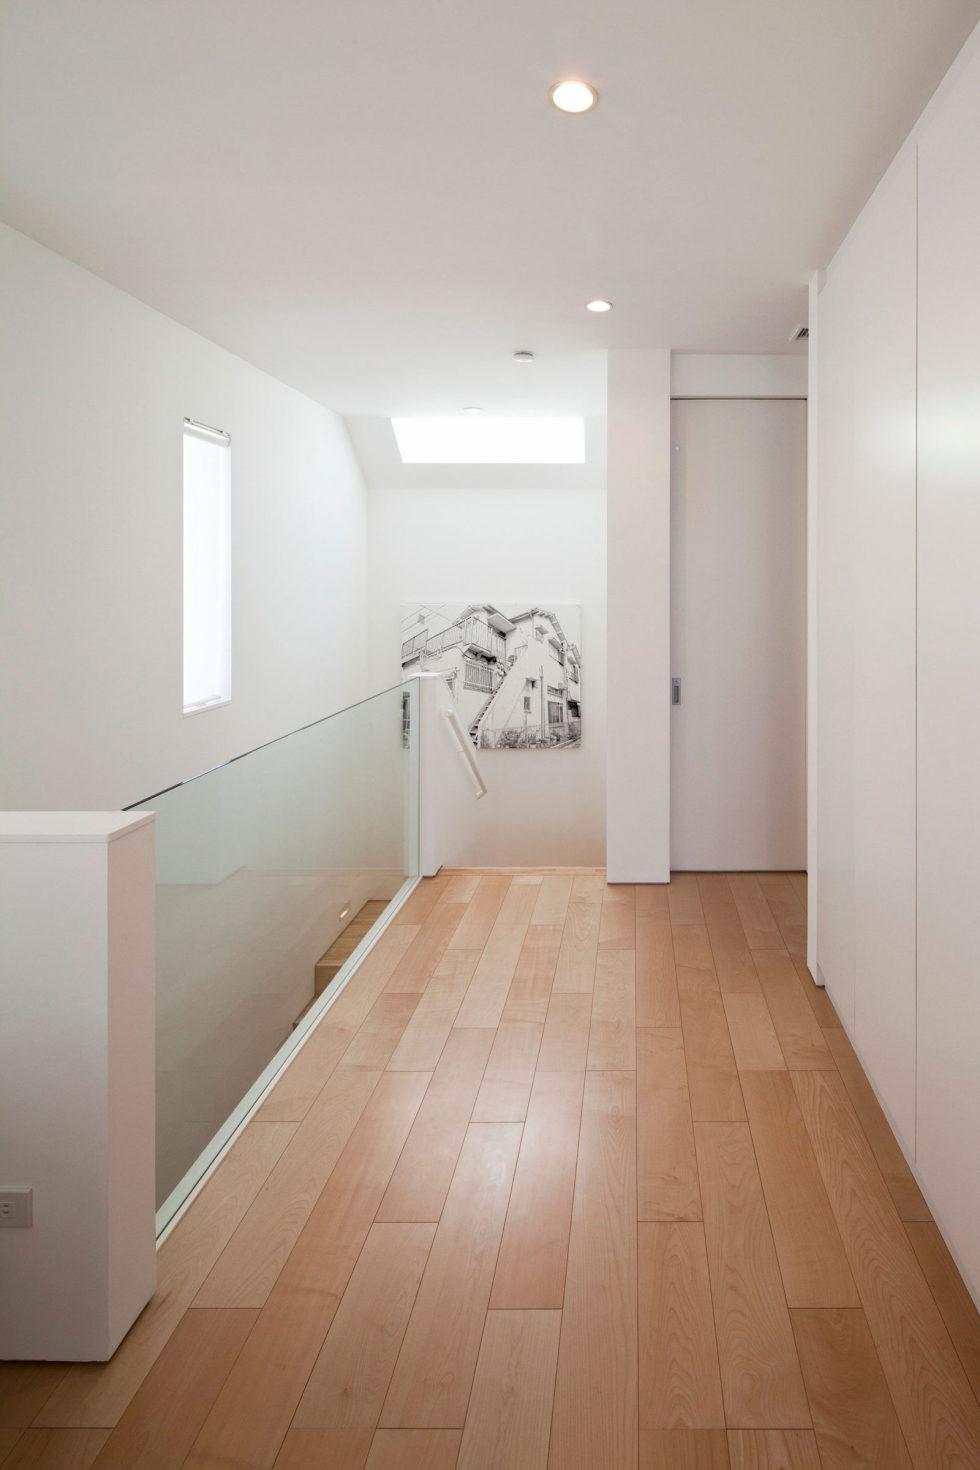 Zen Design House From RCK Design Studio In Japan 19